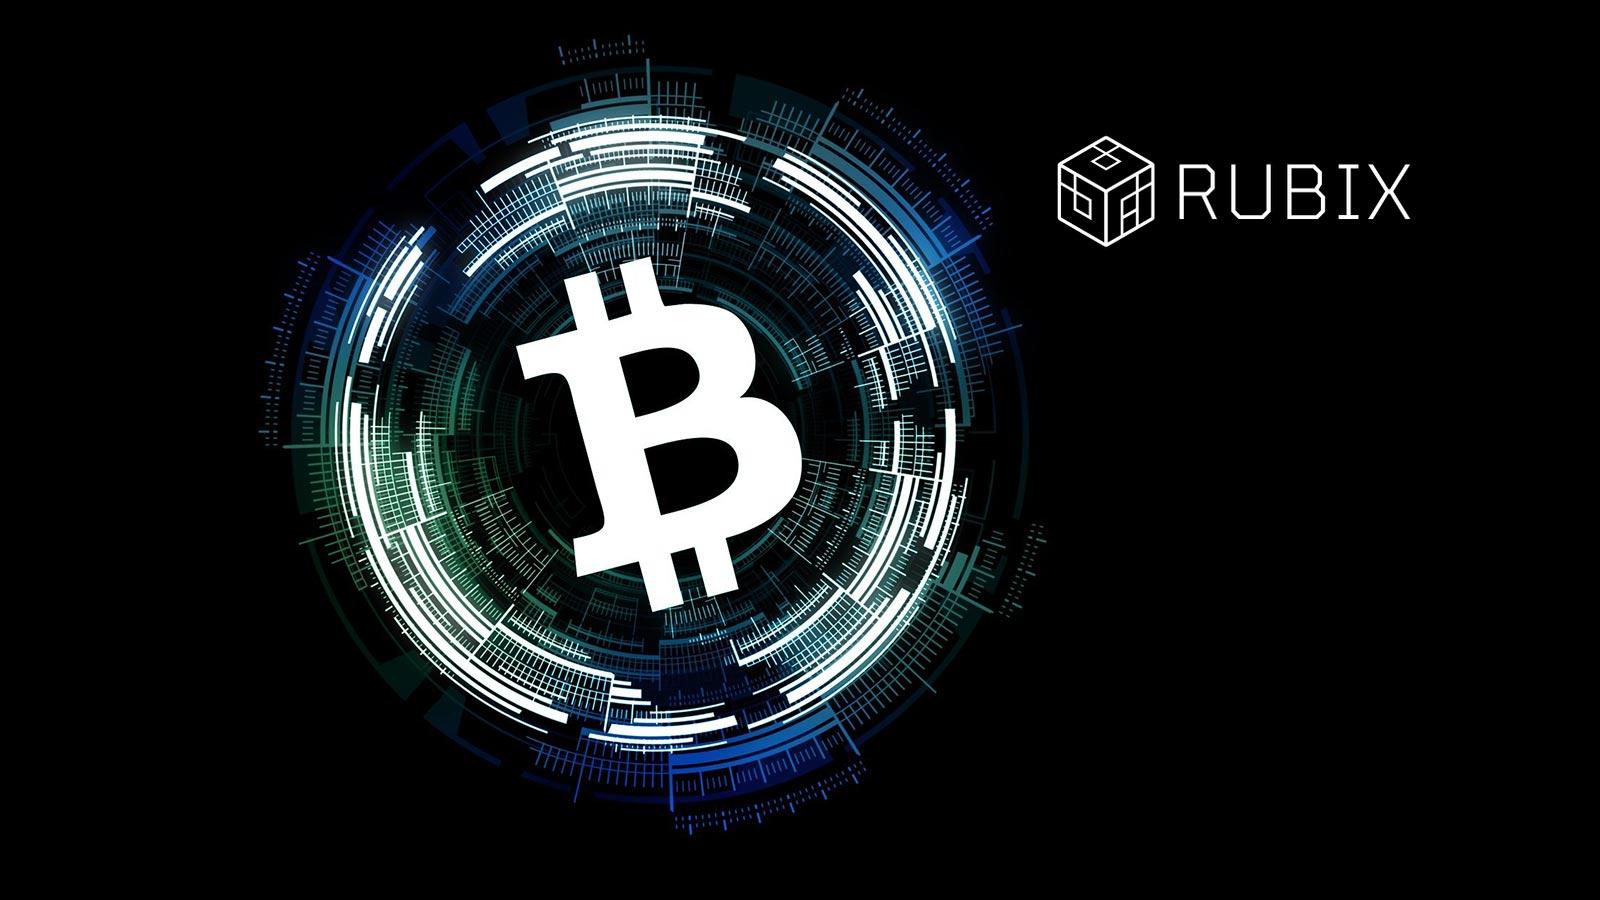 RubiX-Blockchain-Green-Initiative-Solves-Bitcoins-Carbon-Emission-Problem